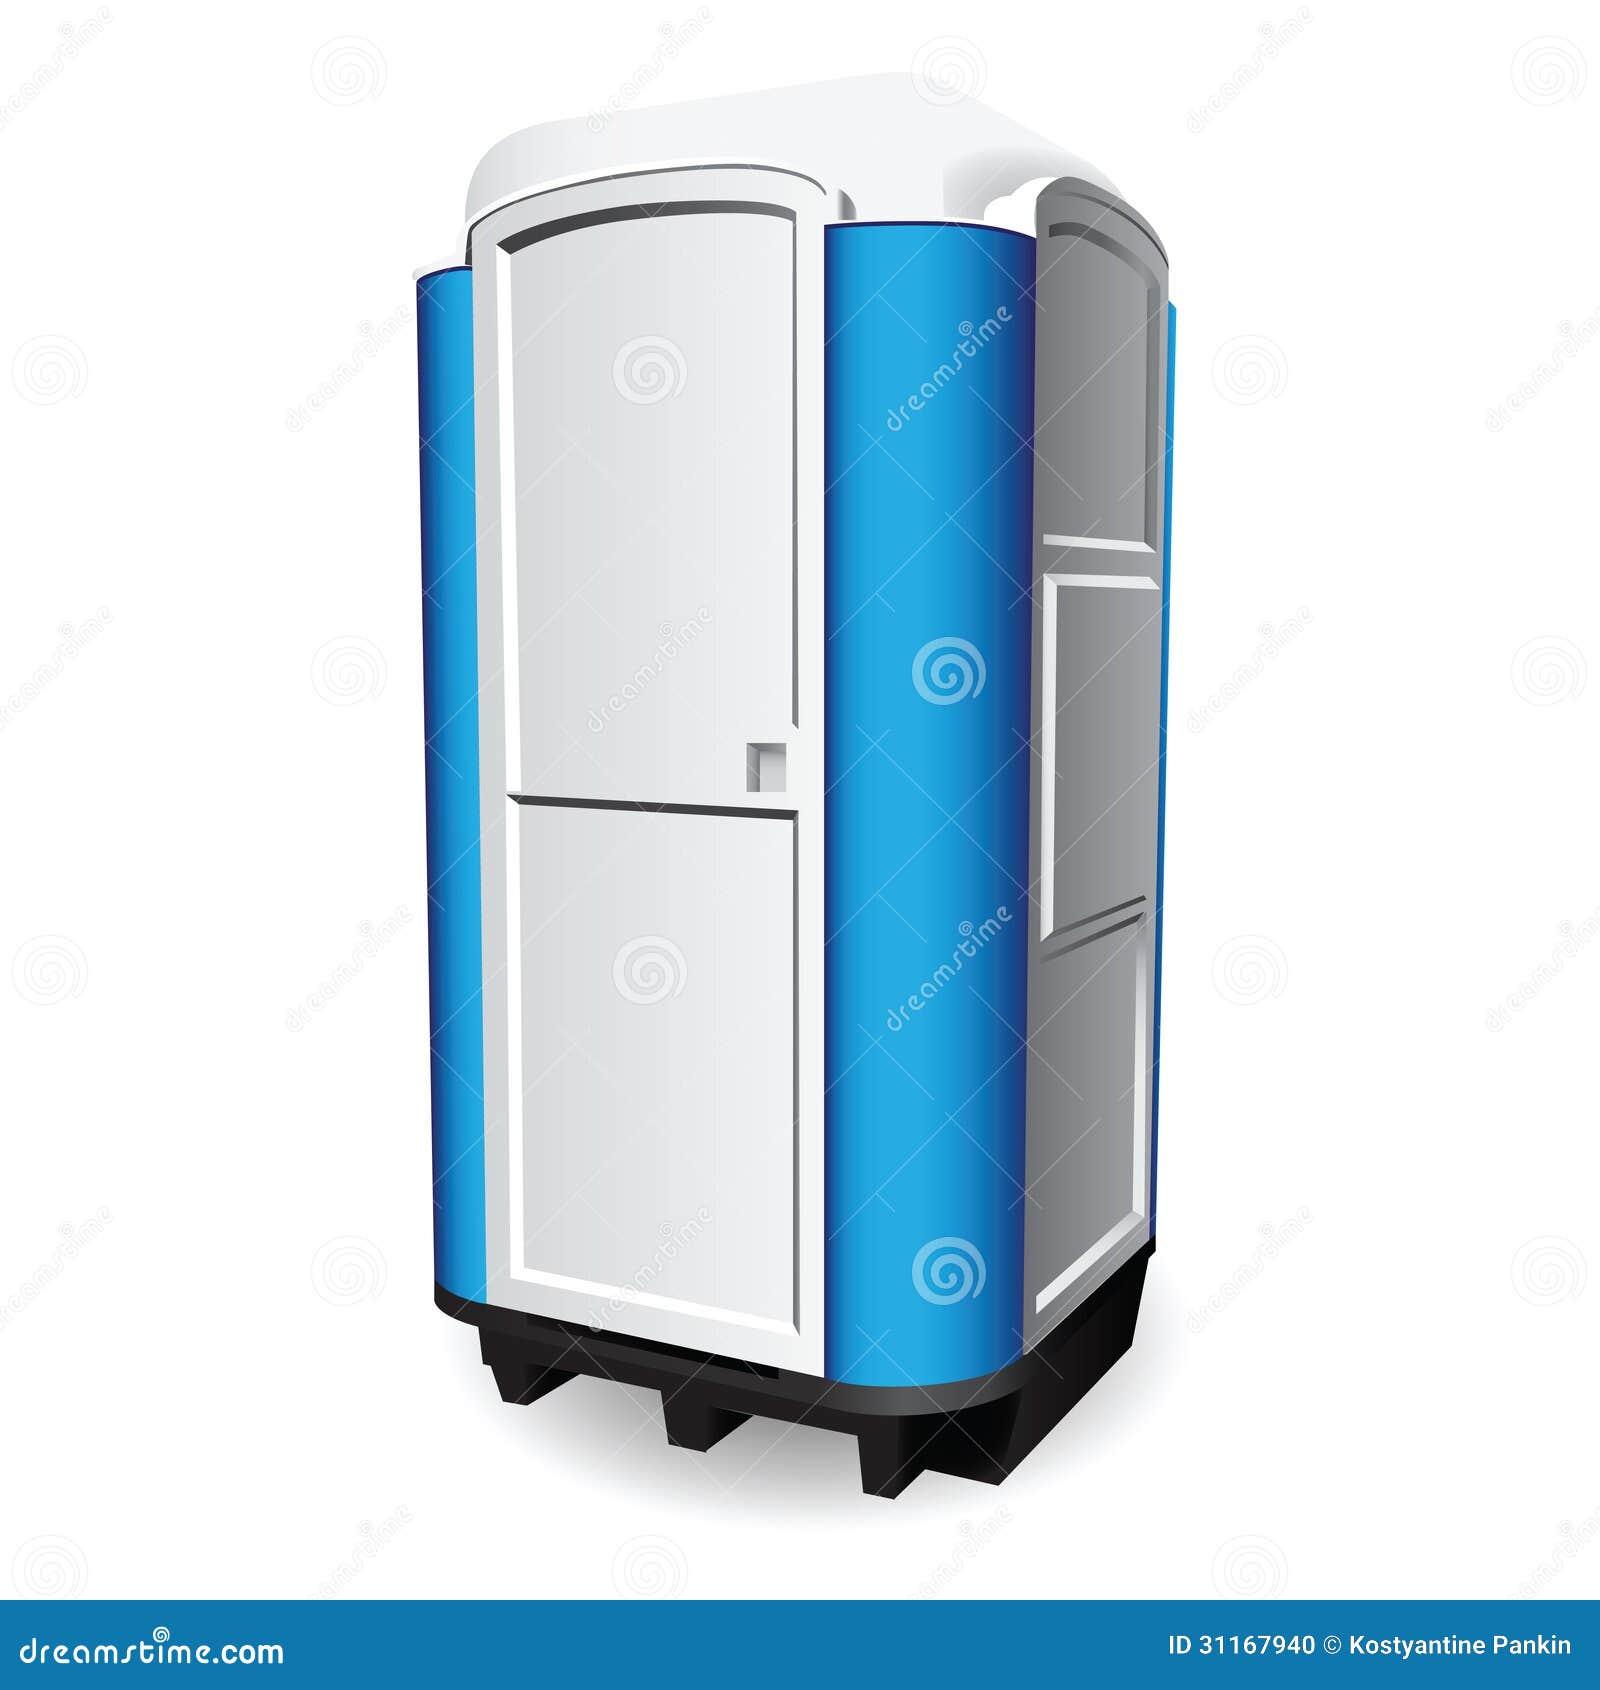 mobile toilet business plan